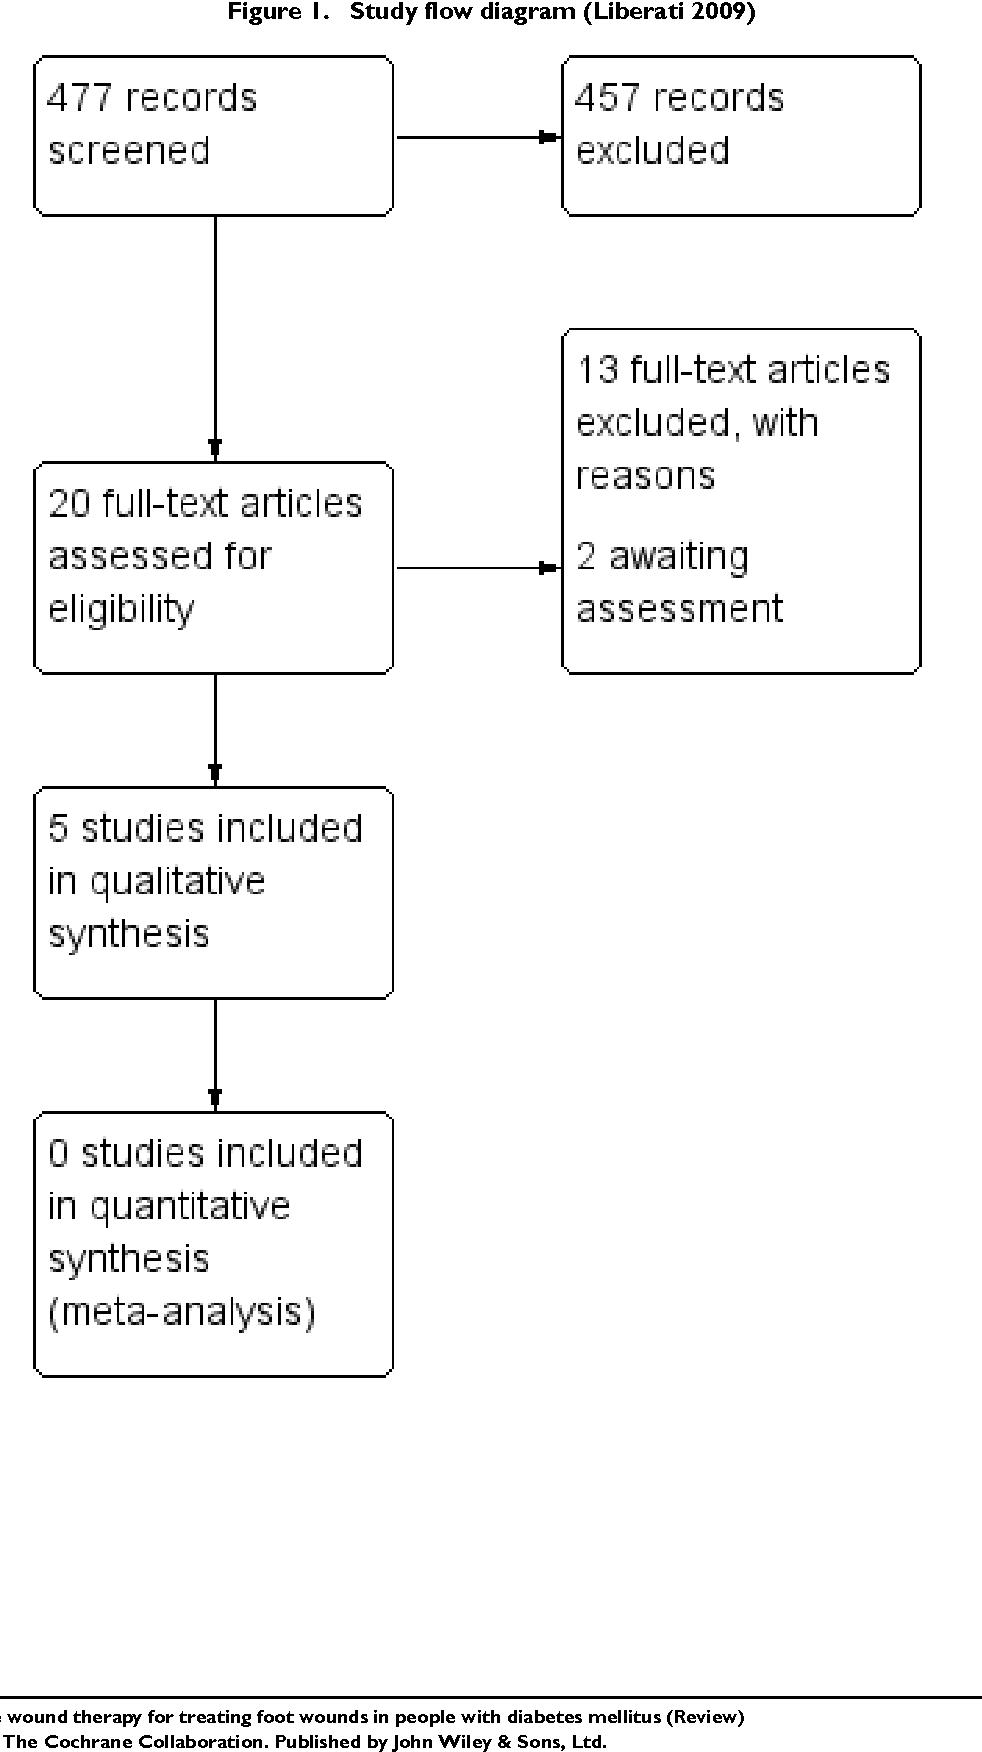 medium resolution of study flow diagram liberati 2009